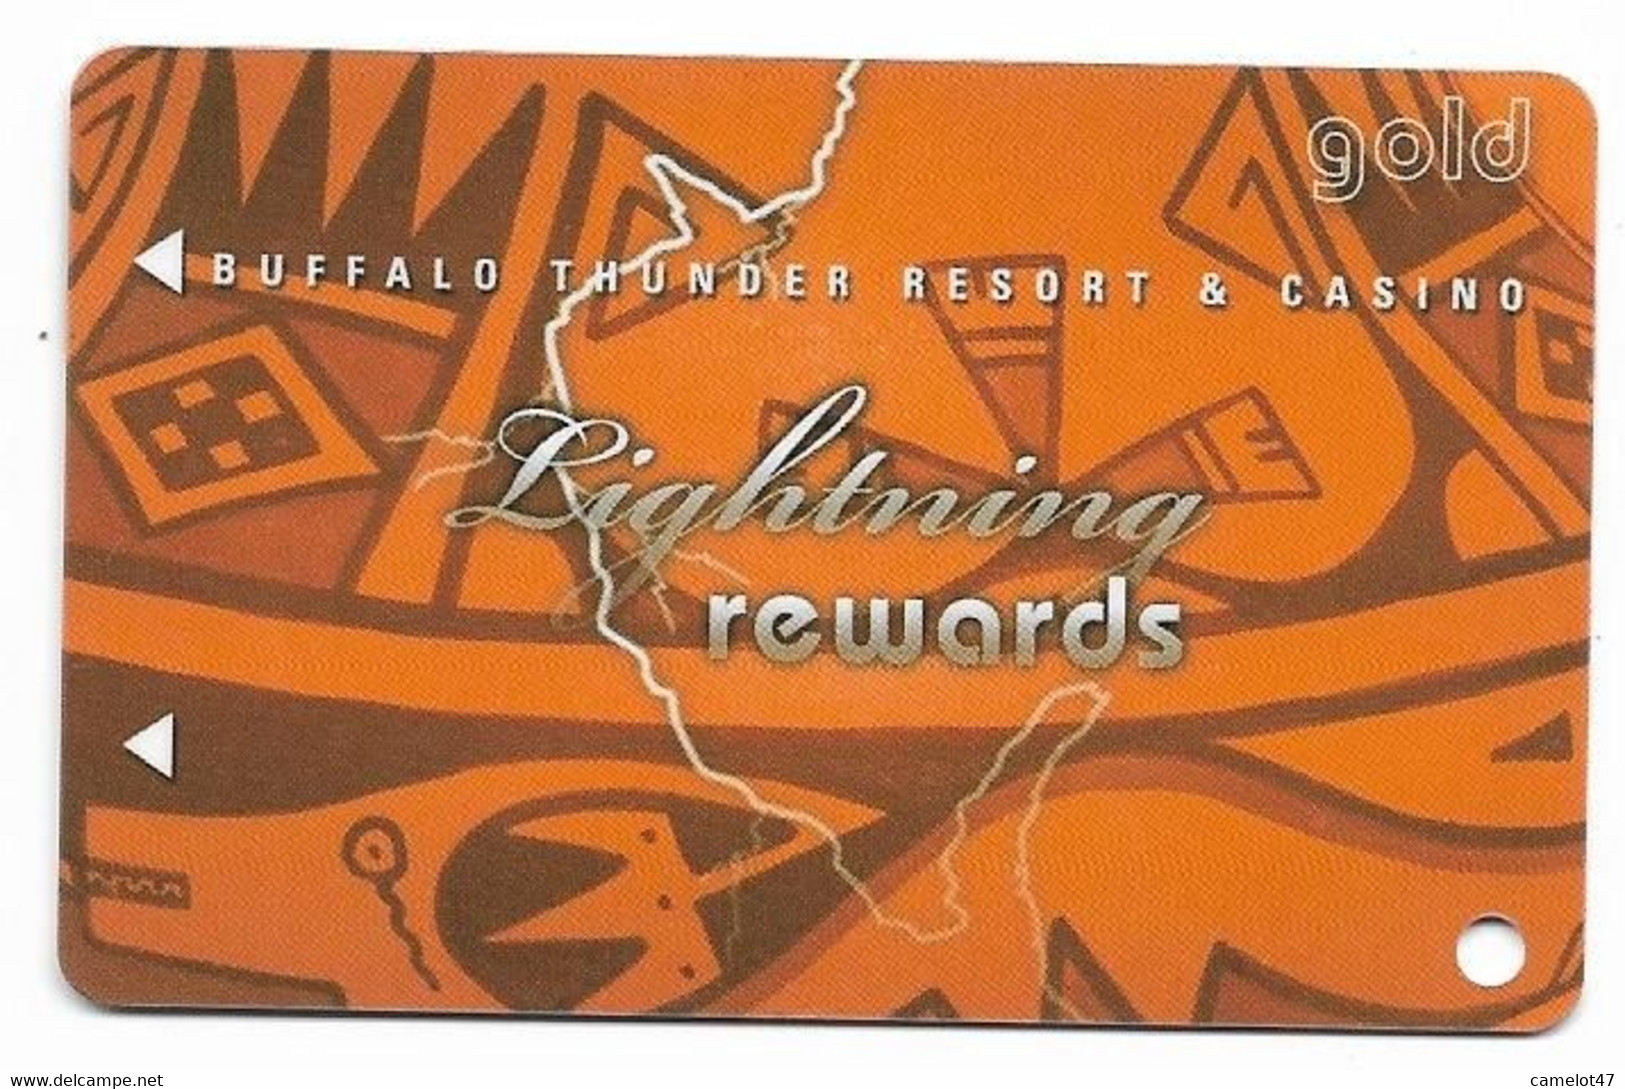 Buffalo Thunder Resort & Casino, Santa Fe, NM,  U.S.A., Older Used BLANK  Slot Or Player's Card, # Buffalothunder-3blank - Casino Cards